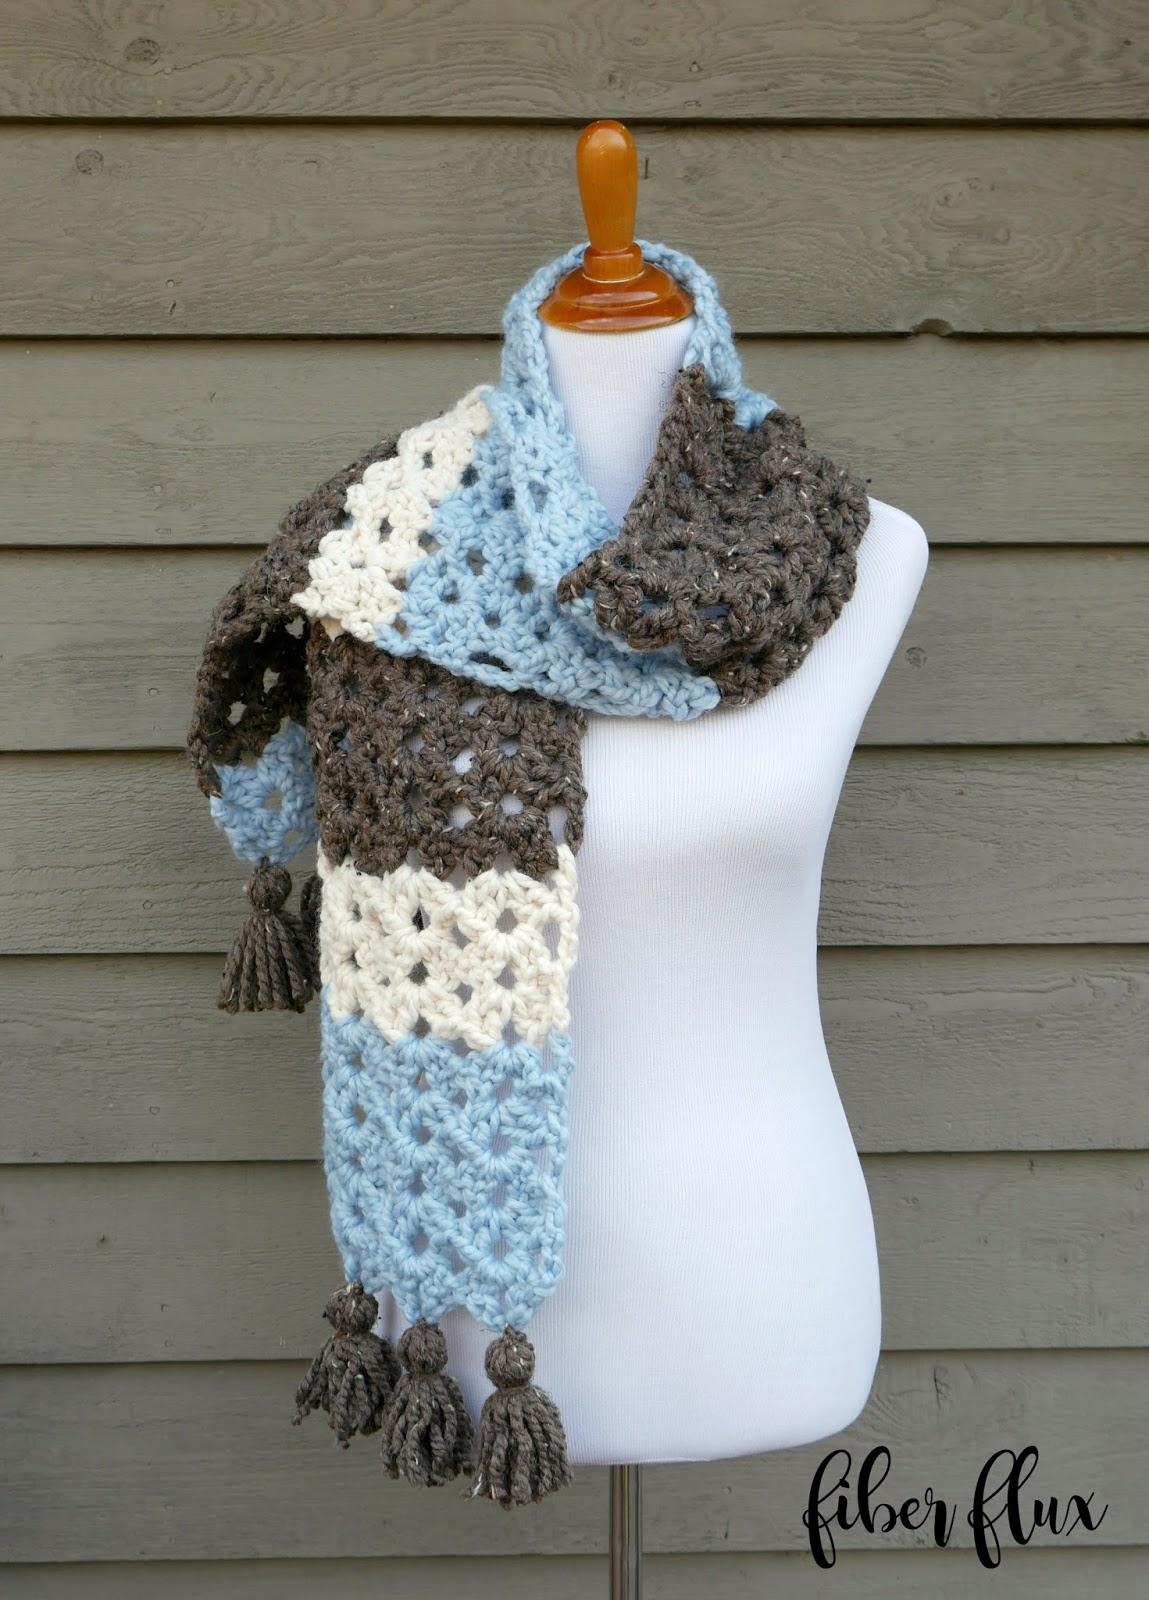 Fiber flux free crochet patternwinter woods scarf free crochet patternwinter woods scarf bankloansurffo Choice Image